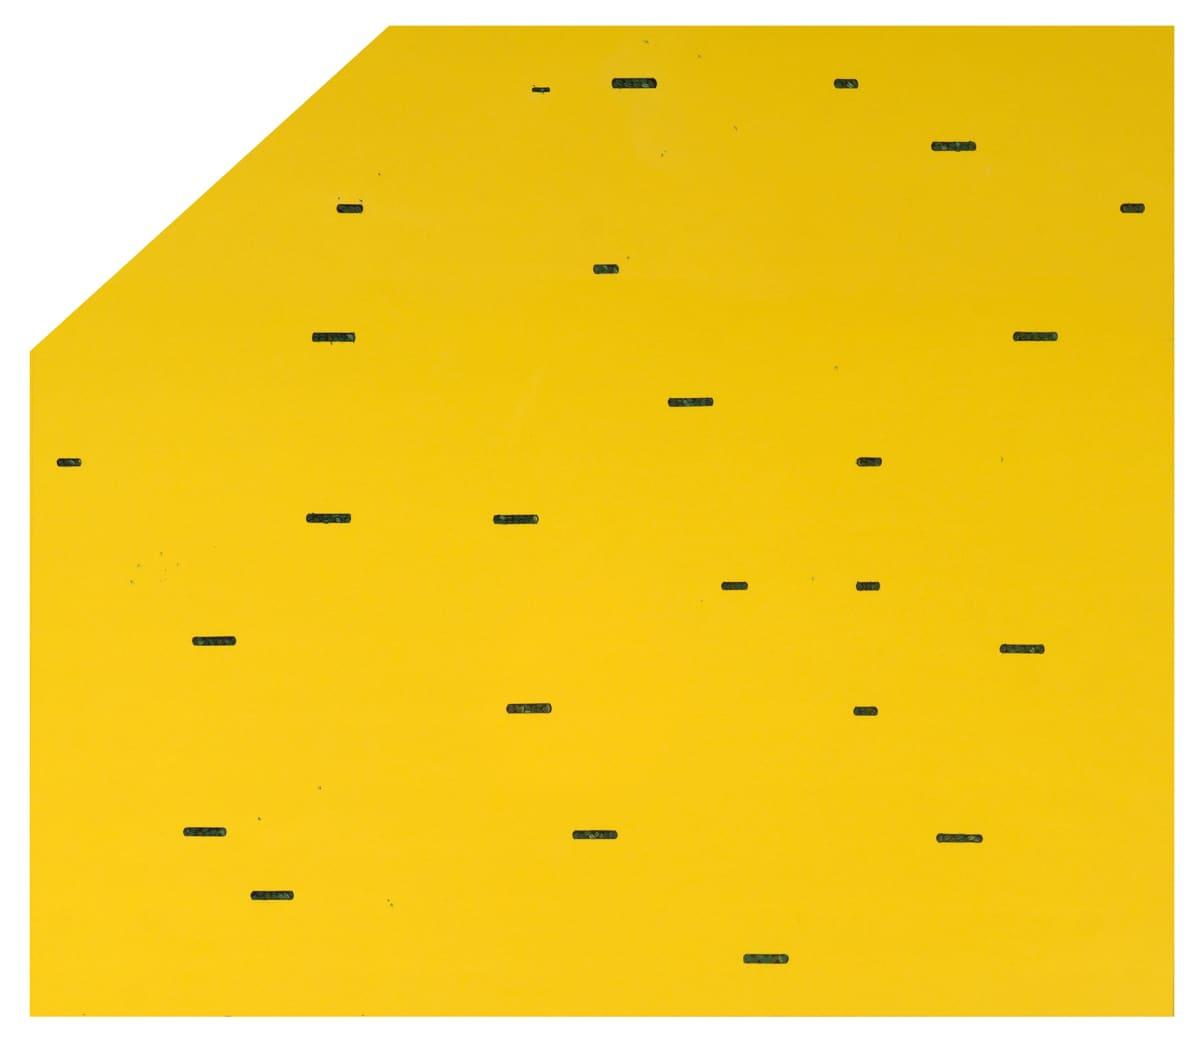 Wardha Shabbir b. 1987Passengers, 2020 Gouache on paper 50.8 x 76.2 cm 20 x 30 in